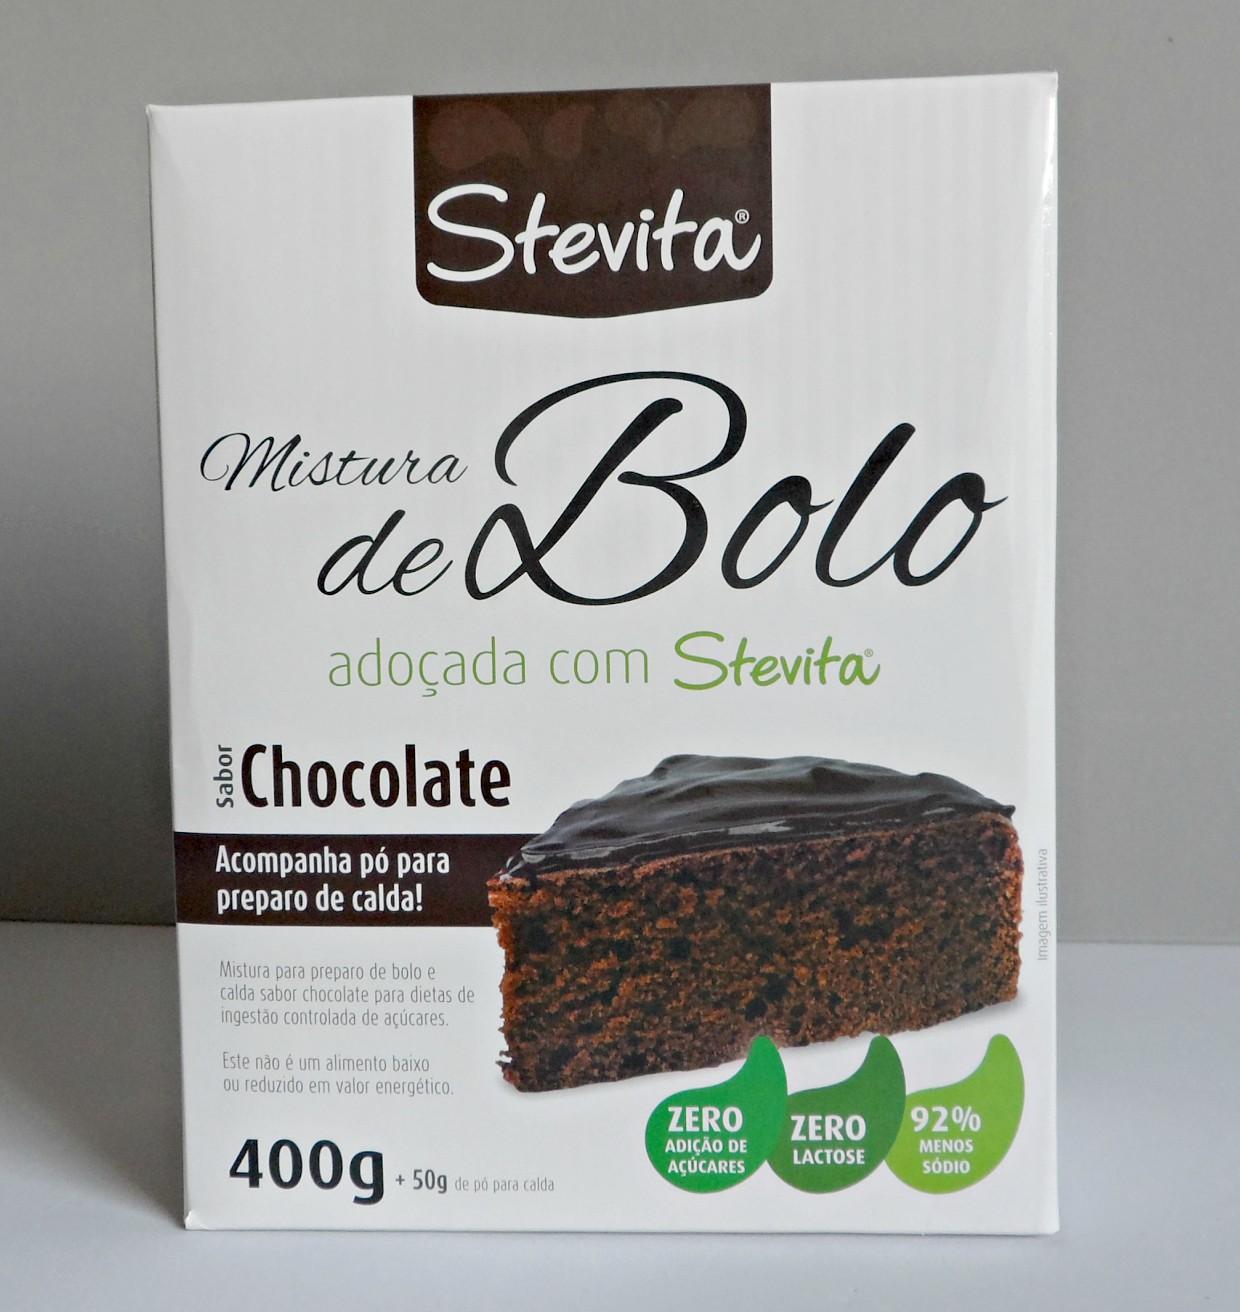 Stevita